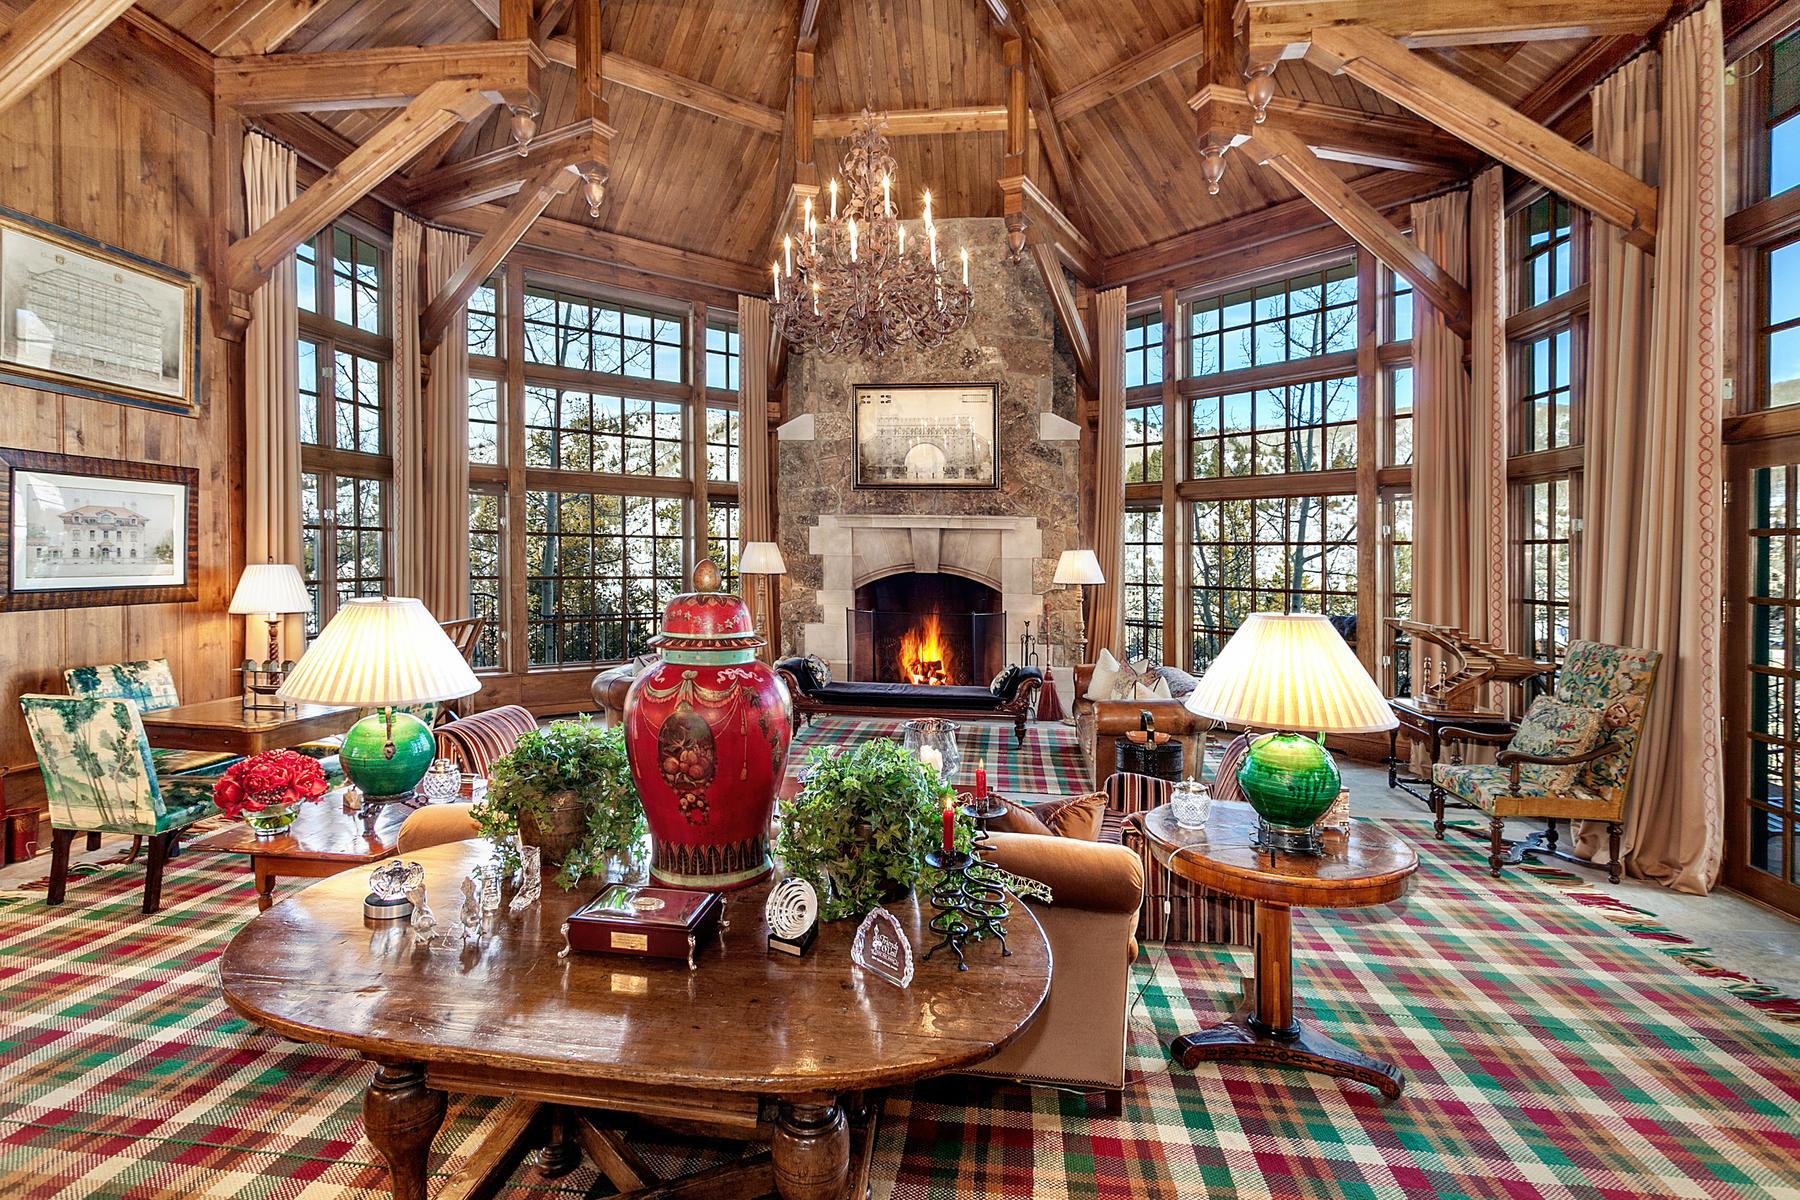 Additional photo for property listing at Chateau #11 Ski-in Ski-out Estate 51 Chateau Lane #11 Beaver Creek, Colorado 81620 United States